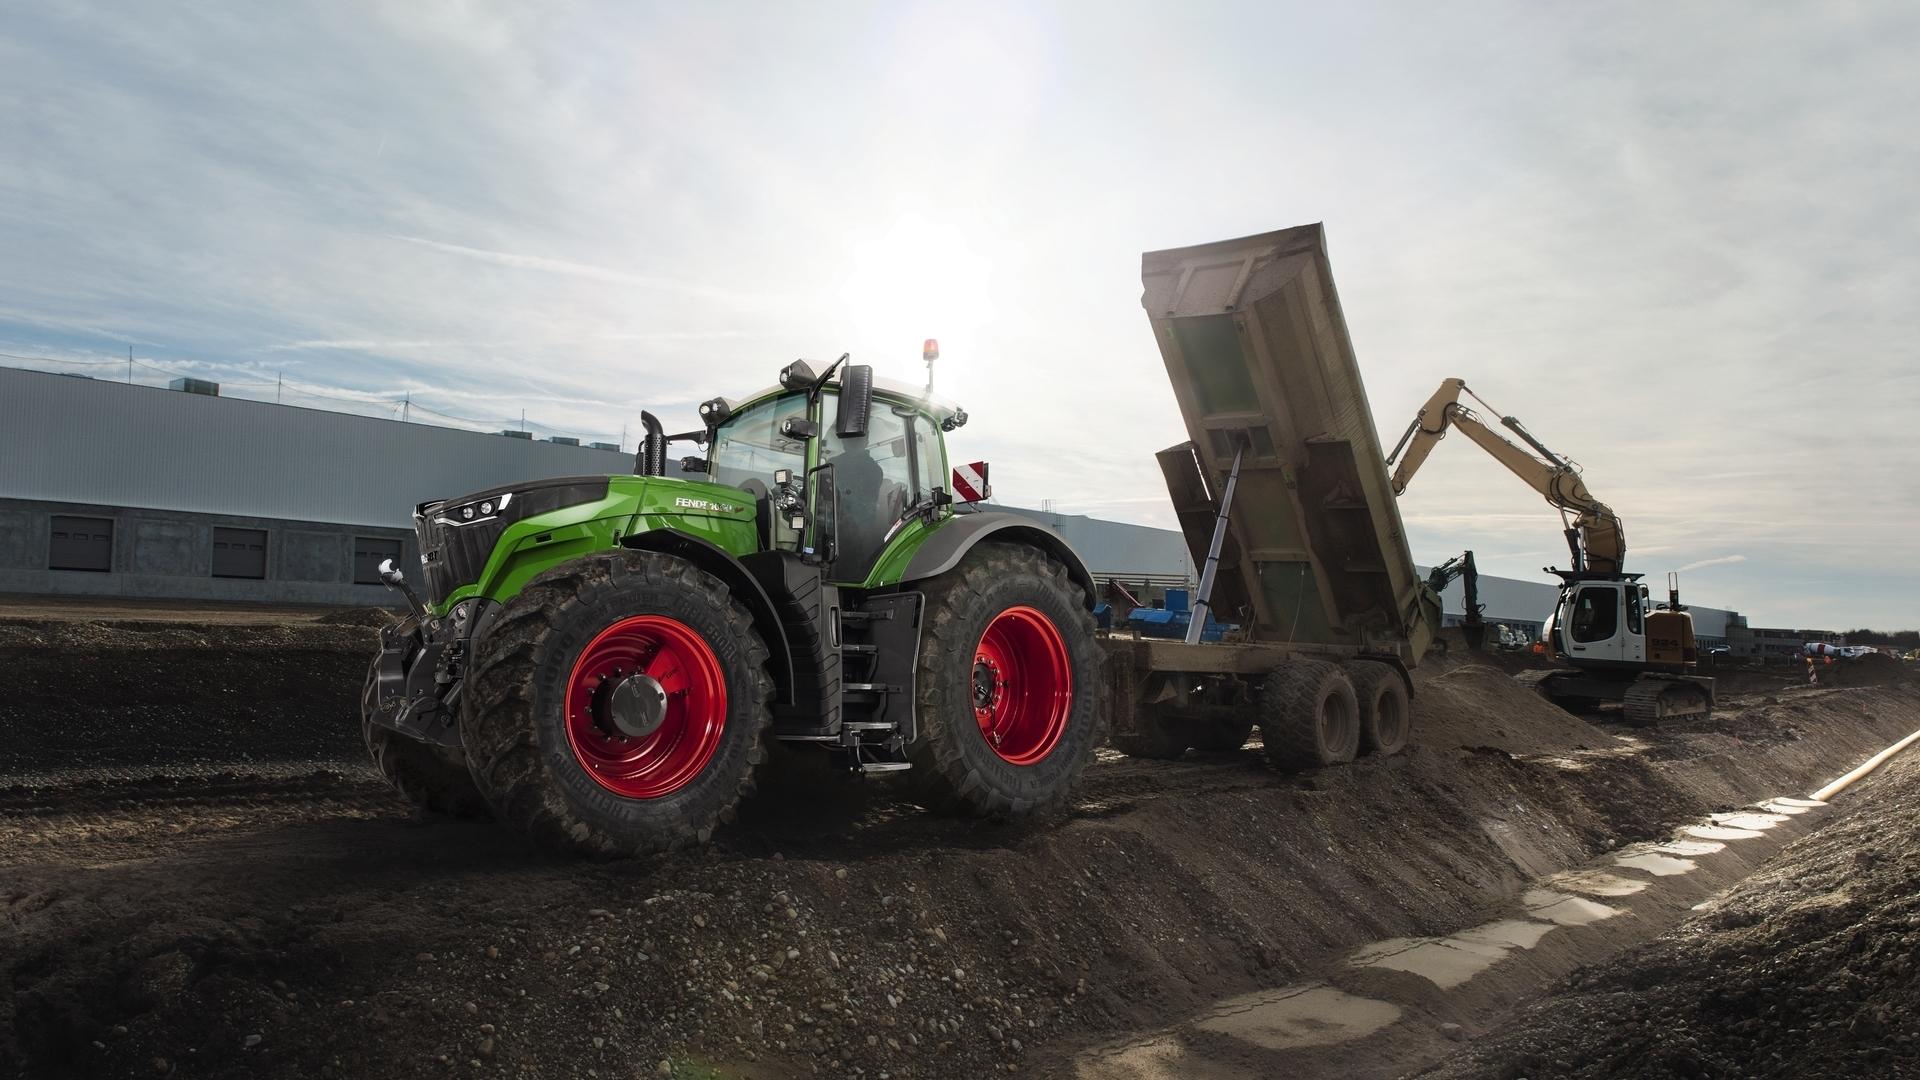 Quote Wallpapers Phone Fendt 1000 Series Tractors Maple Lane Farm Service